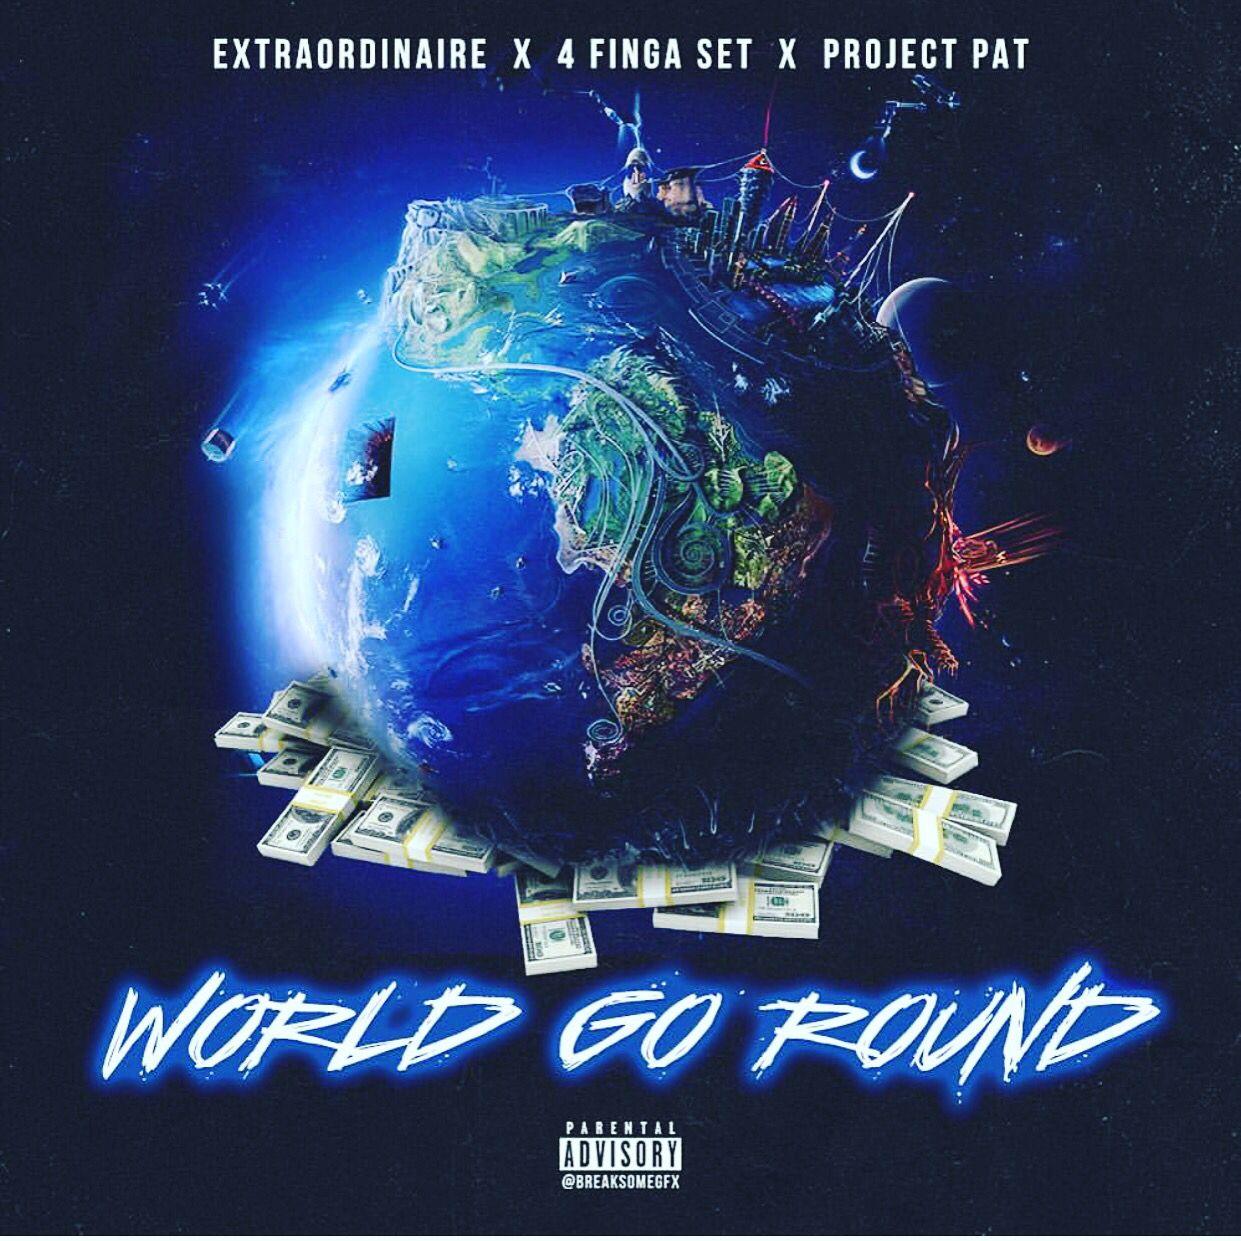 Extraordinaire  #worldgoround ft.  Project Pat & 4 Finga Set  #pressplay #playloud #newsouthernorder #Immaculatesc #lifestyle #followus #jointhetakeover #summer16